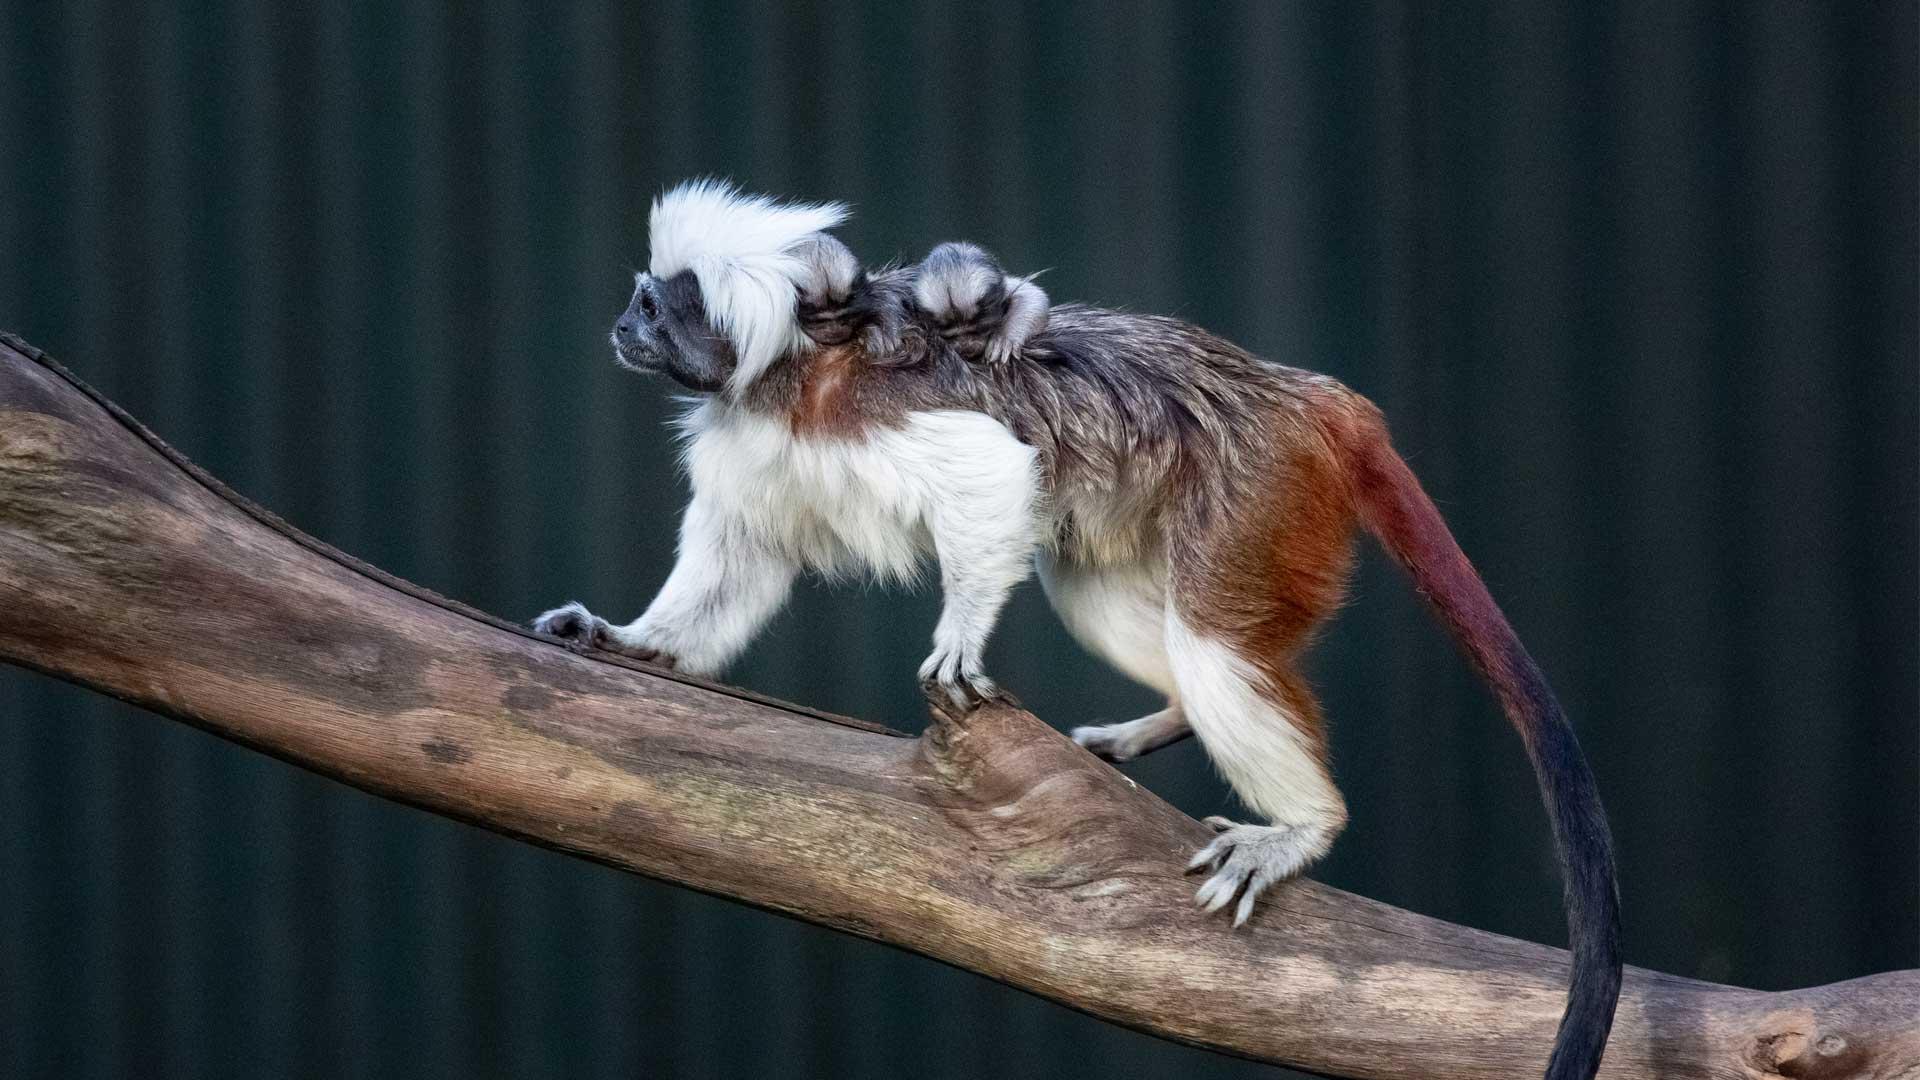 https://rfacdn.nz/zoo/assets/media/cotton-top-babies-gallery-4.jpg